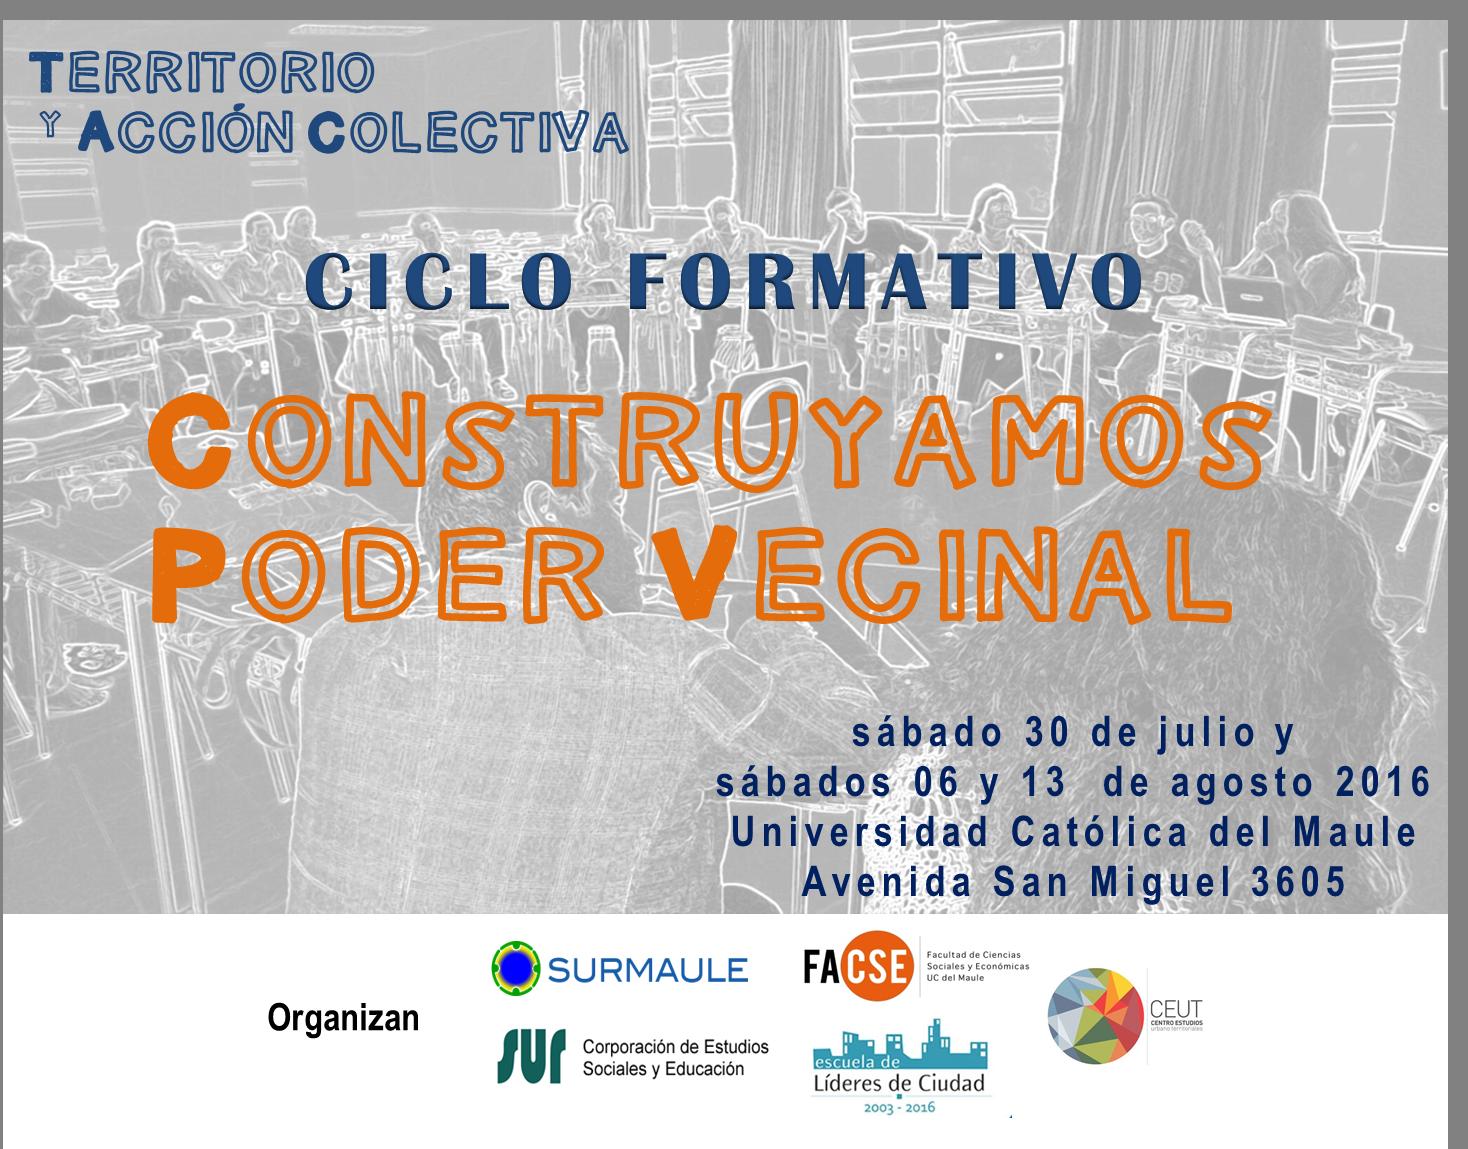 Afiche final Ciclo Formativo 25-07-2016